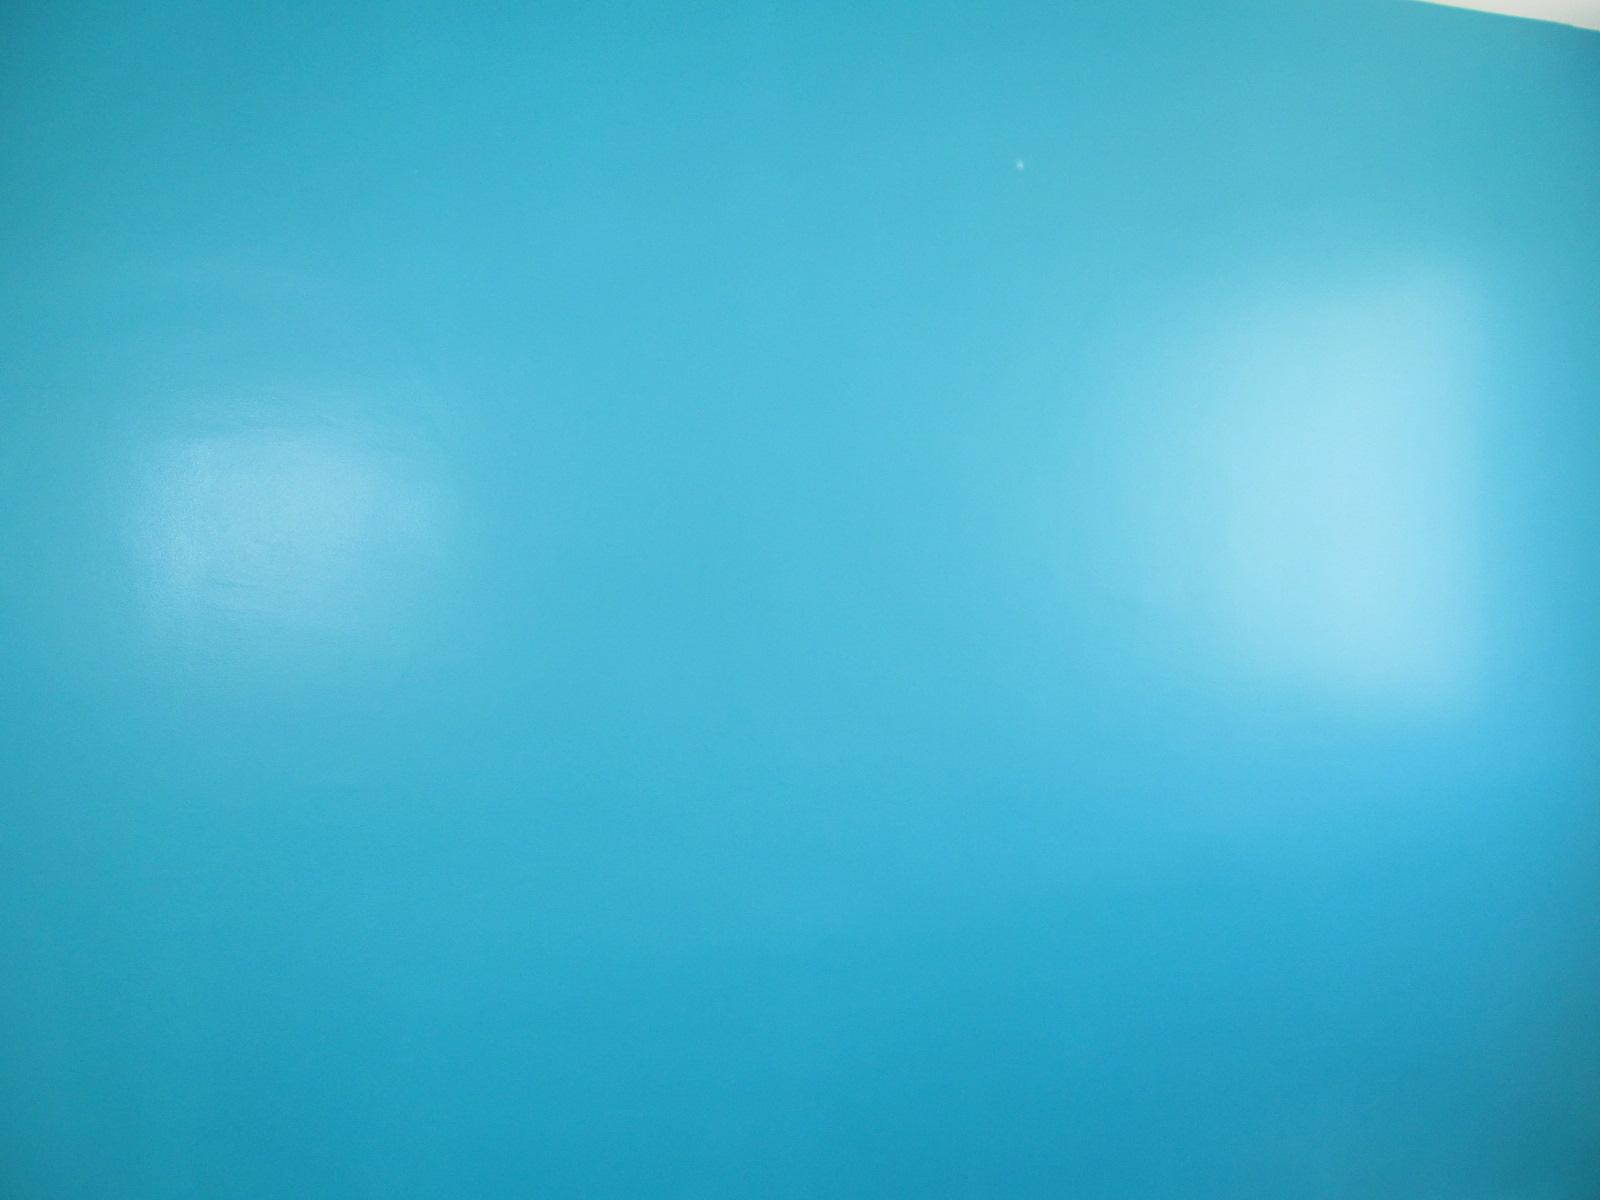 Coral Azul Praia ~ Coral Pluma de Pav u00e3o a saga do apartamento